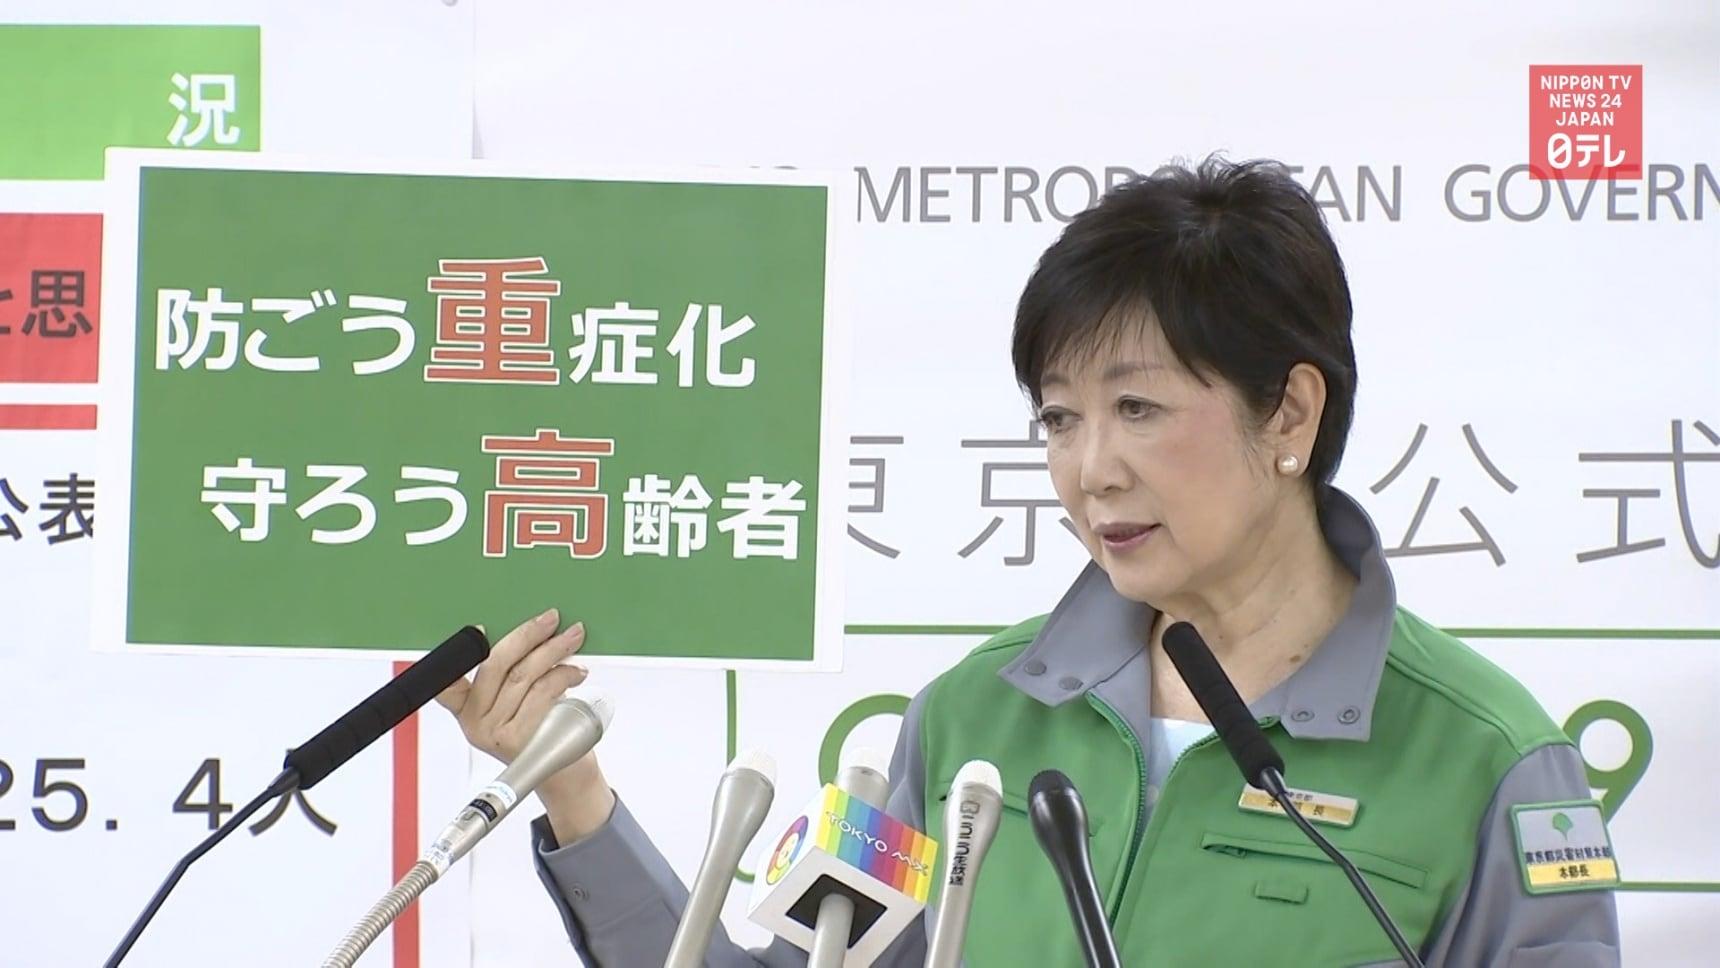 Tokyo Extends Shorter Business Hours Request